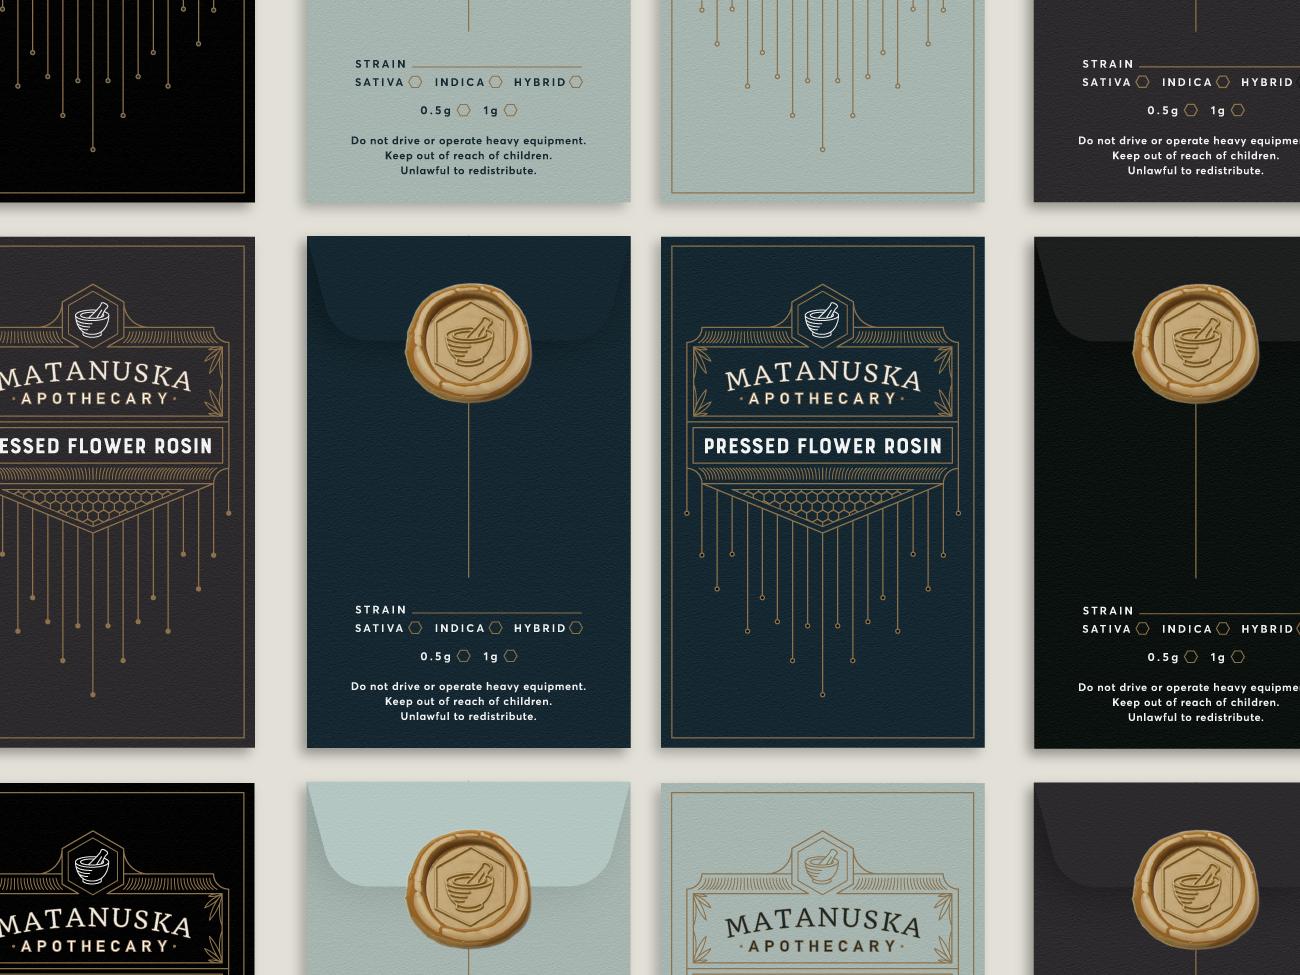 Matanuska apothecary penny envelopes